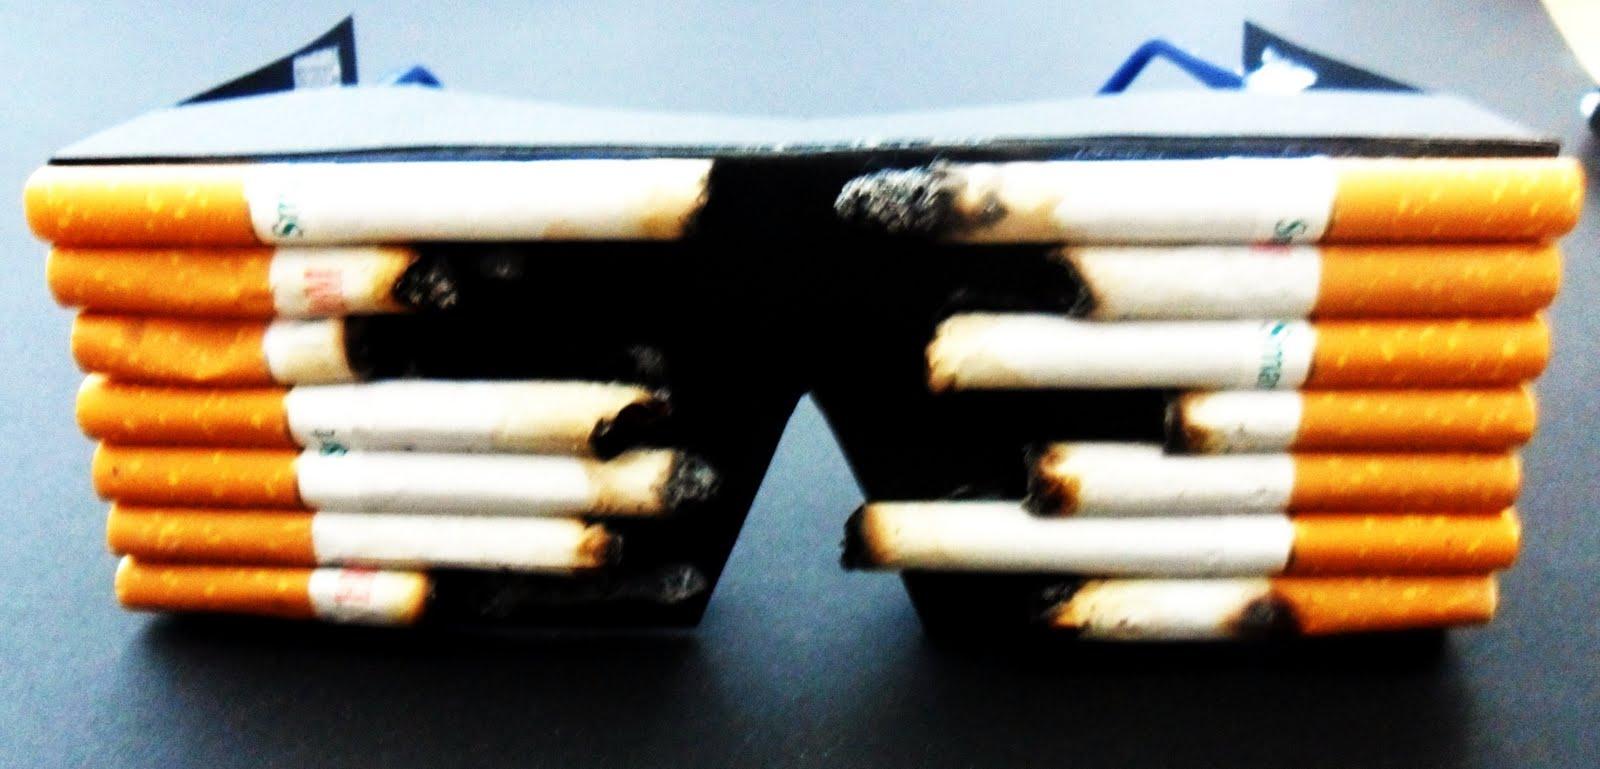 http://2.bp.blogspot.com/-VvPYDqqCKHc/TVudEgMqC8I/AAAAAAAAAEI/V2rxxV33KGE/s1600/Cigarettesunglasses%2B001.JPG